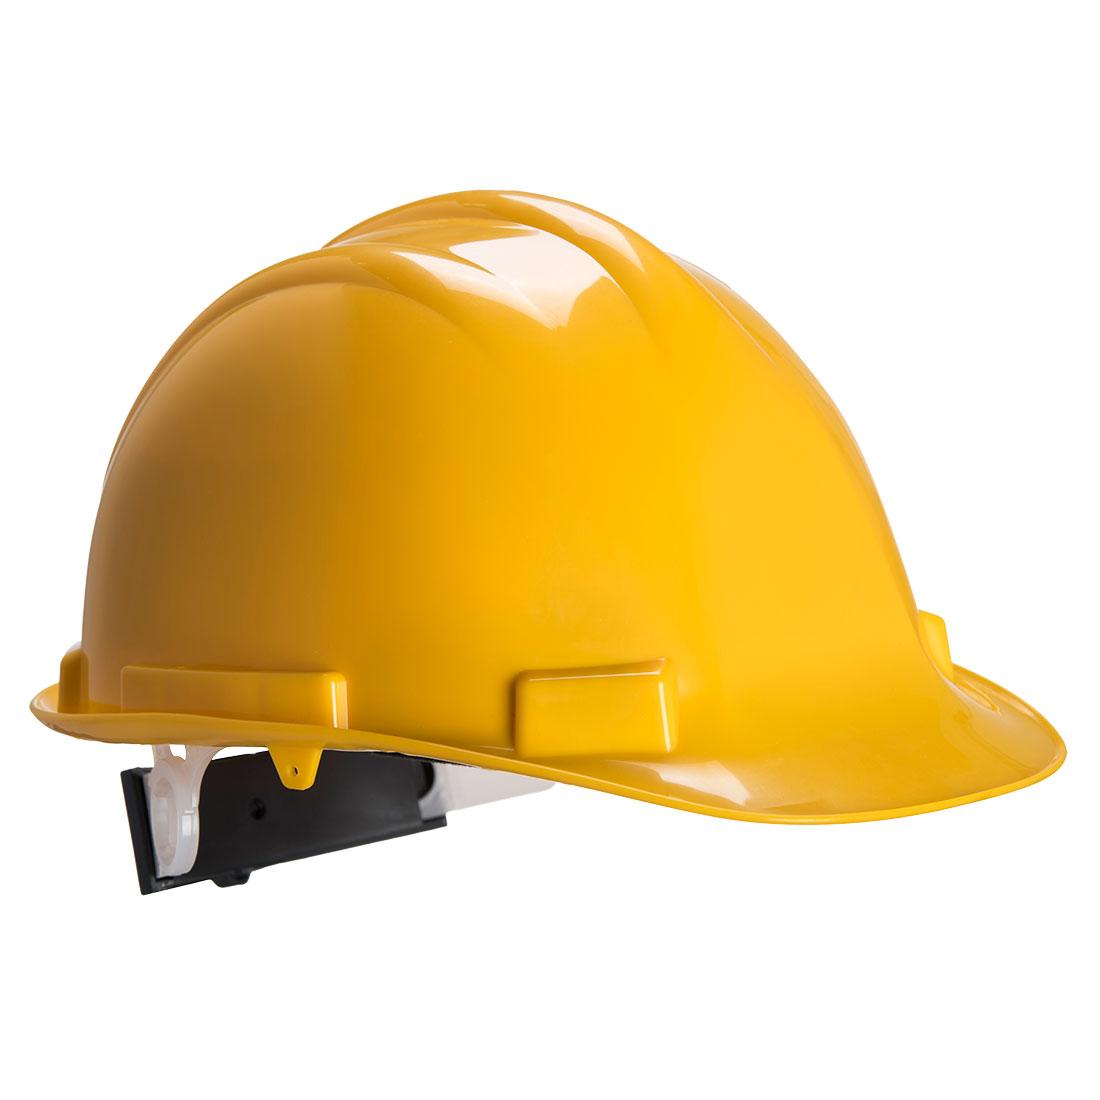 Portwest Expertbase Wheel Safety Helmet - Yellow